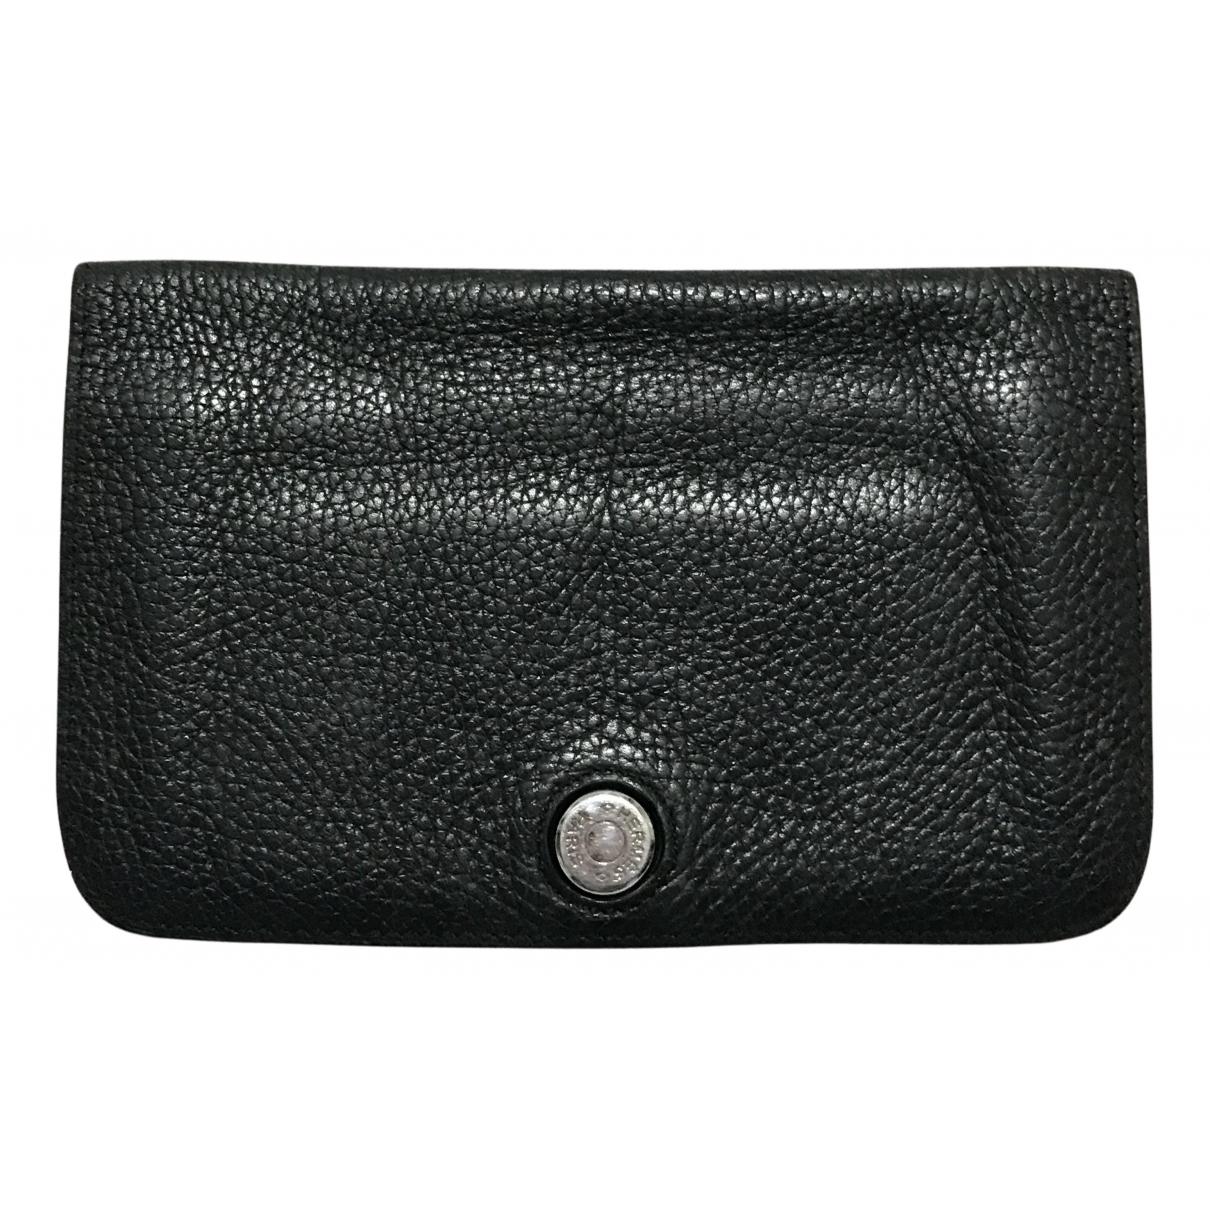 Hermès Dogon Black Leather Purses, wallet & cases for Women N